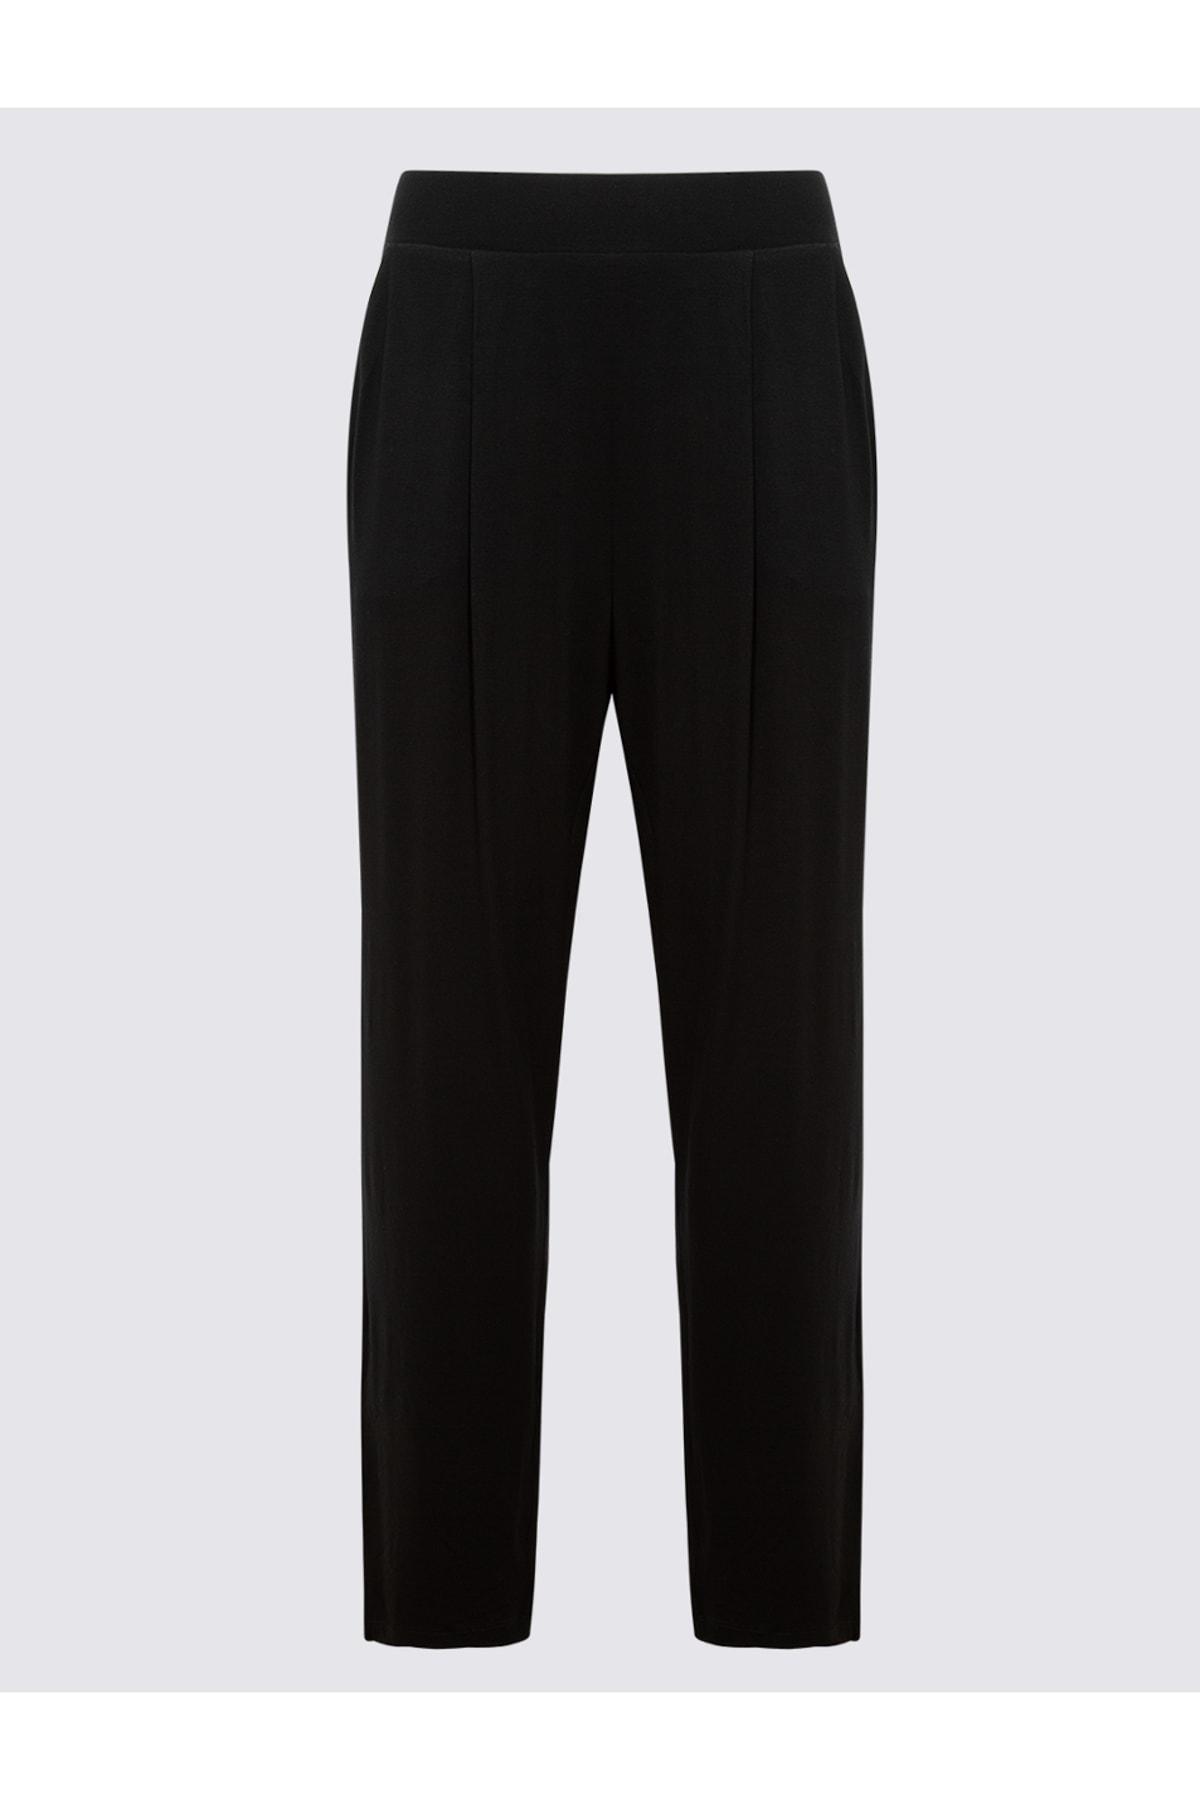 Marks & Spencer Kadın Siyah Jarse Tapered Pantolon T57006622H 1